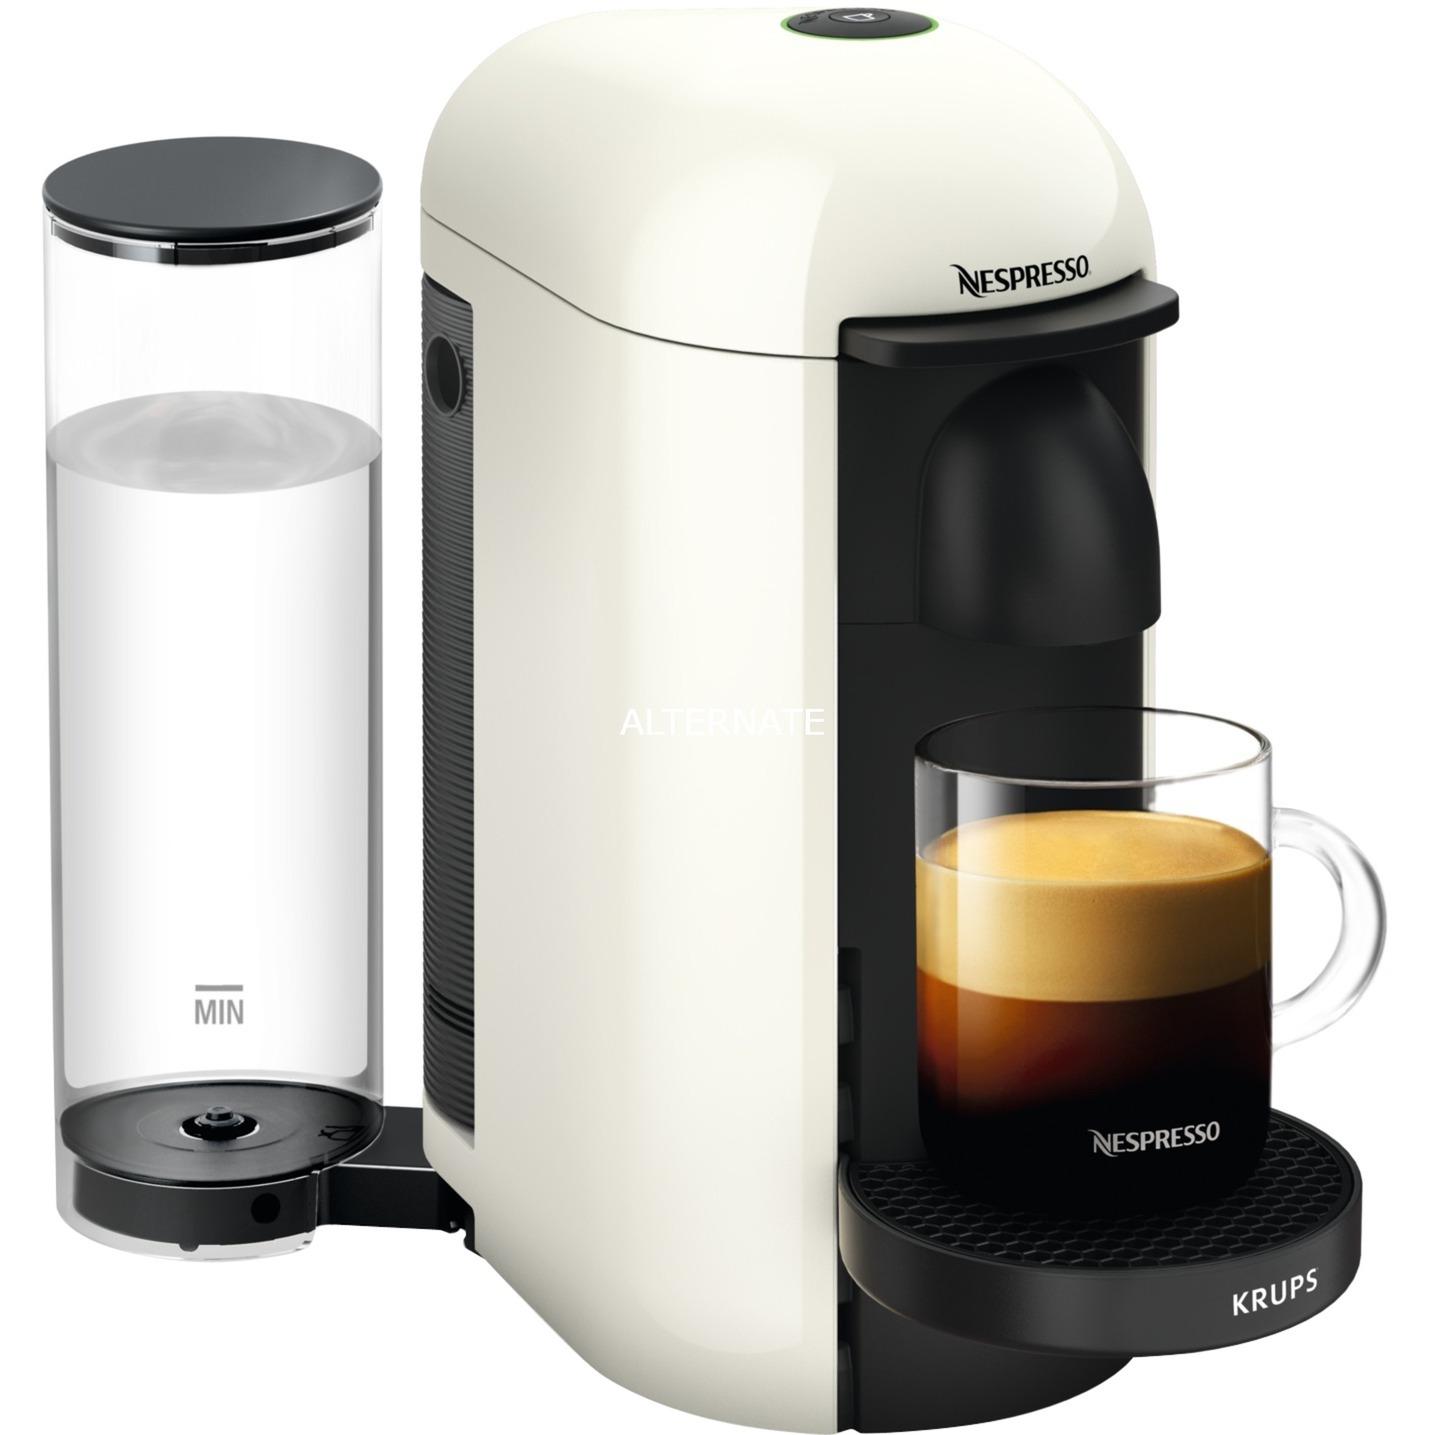 Nespresso VertuoPlus XN9031, Cafetera de cápsulas